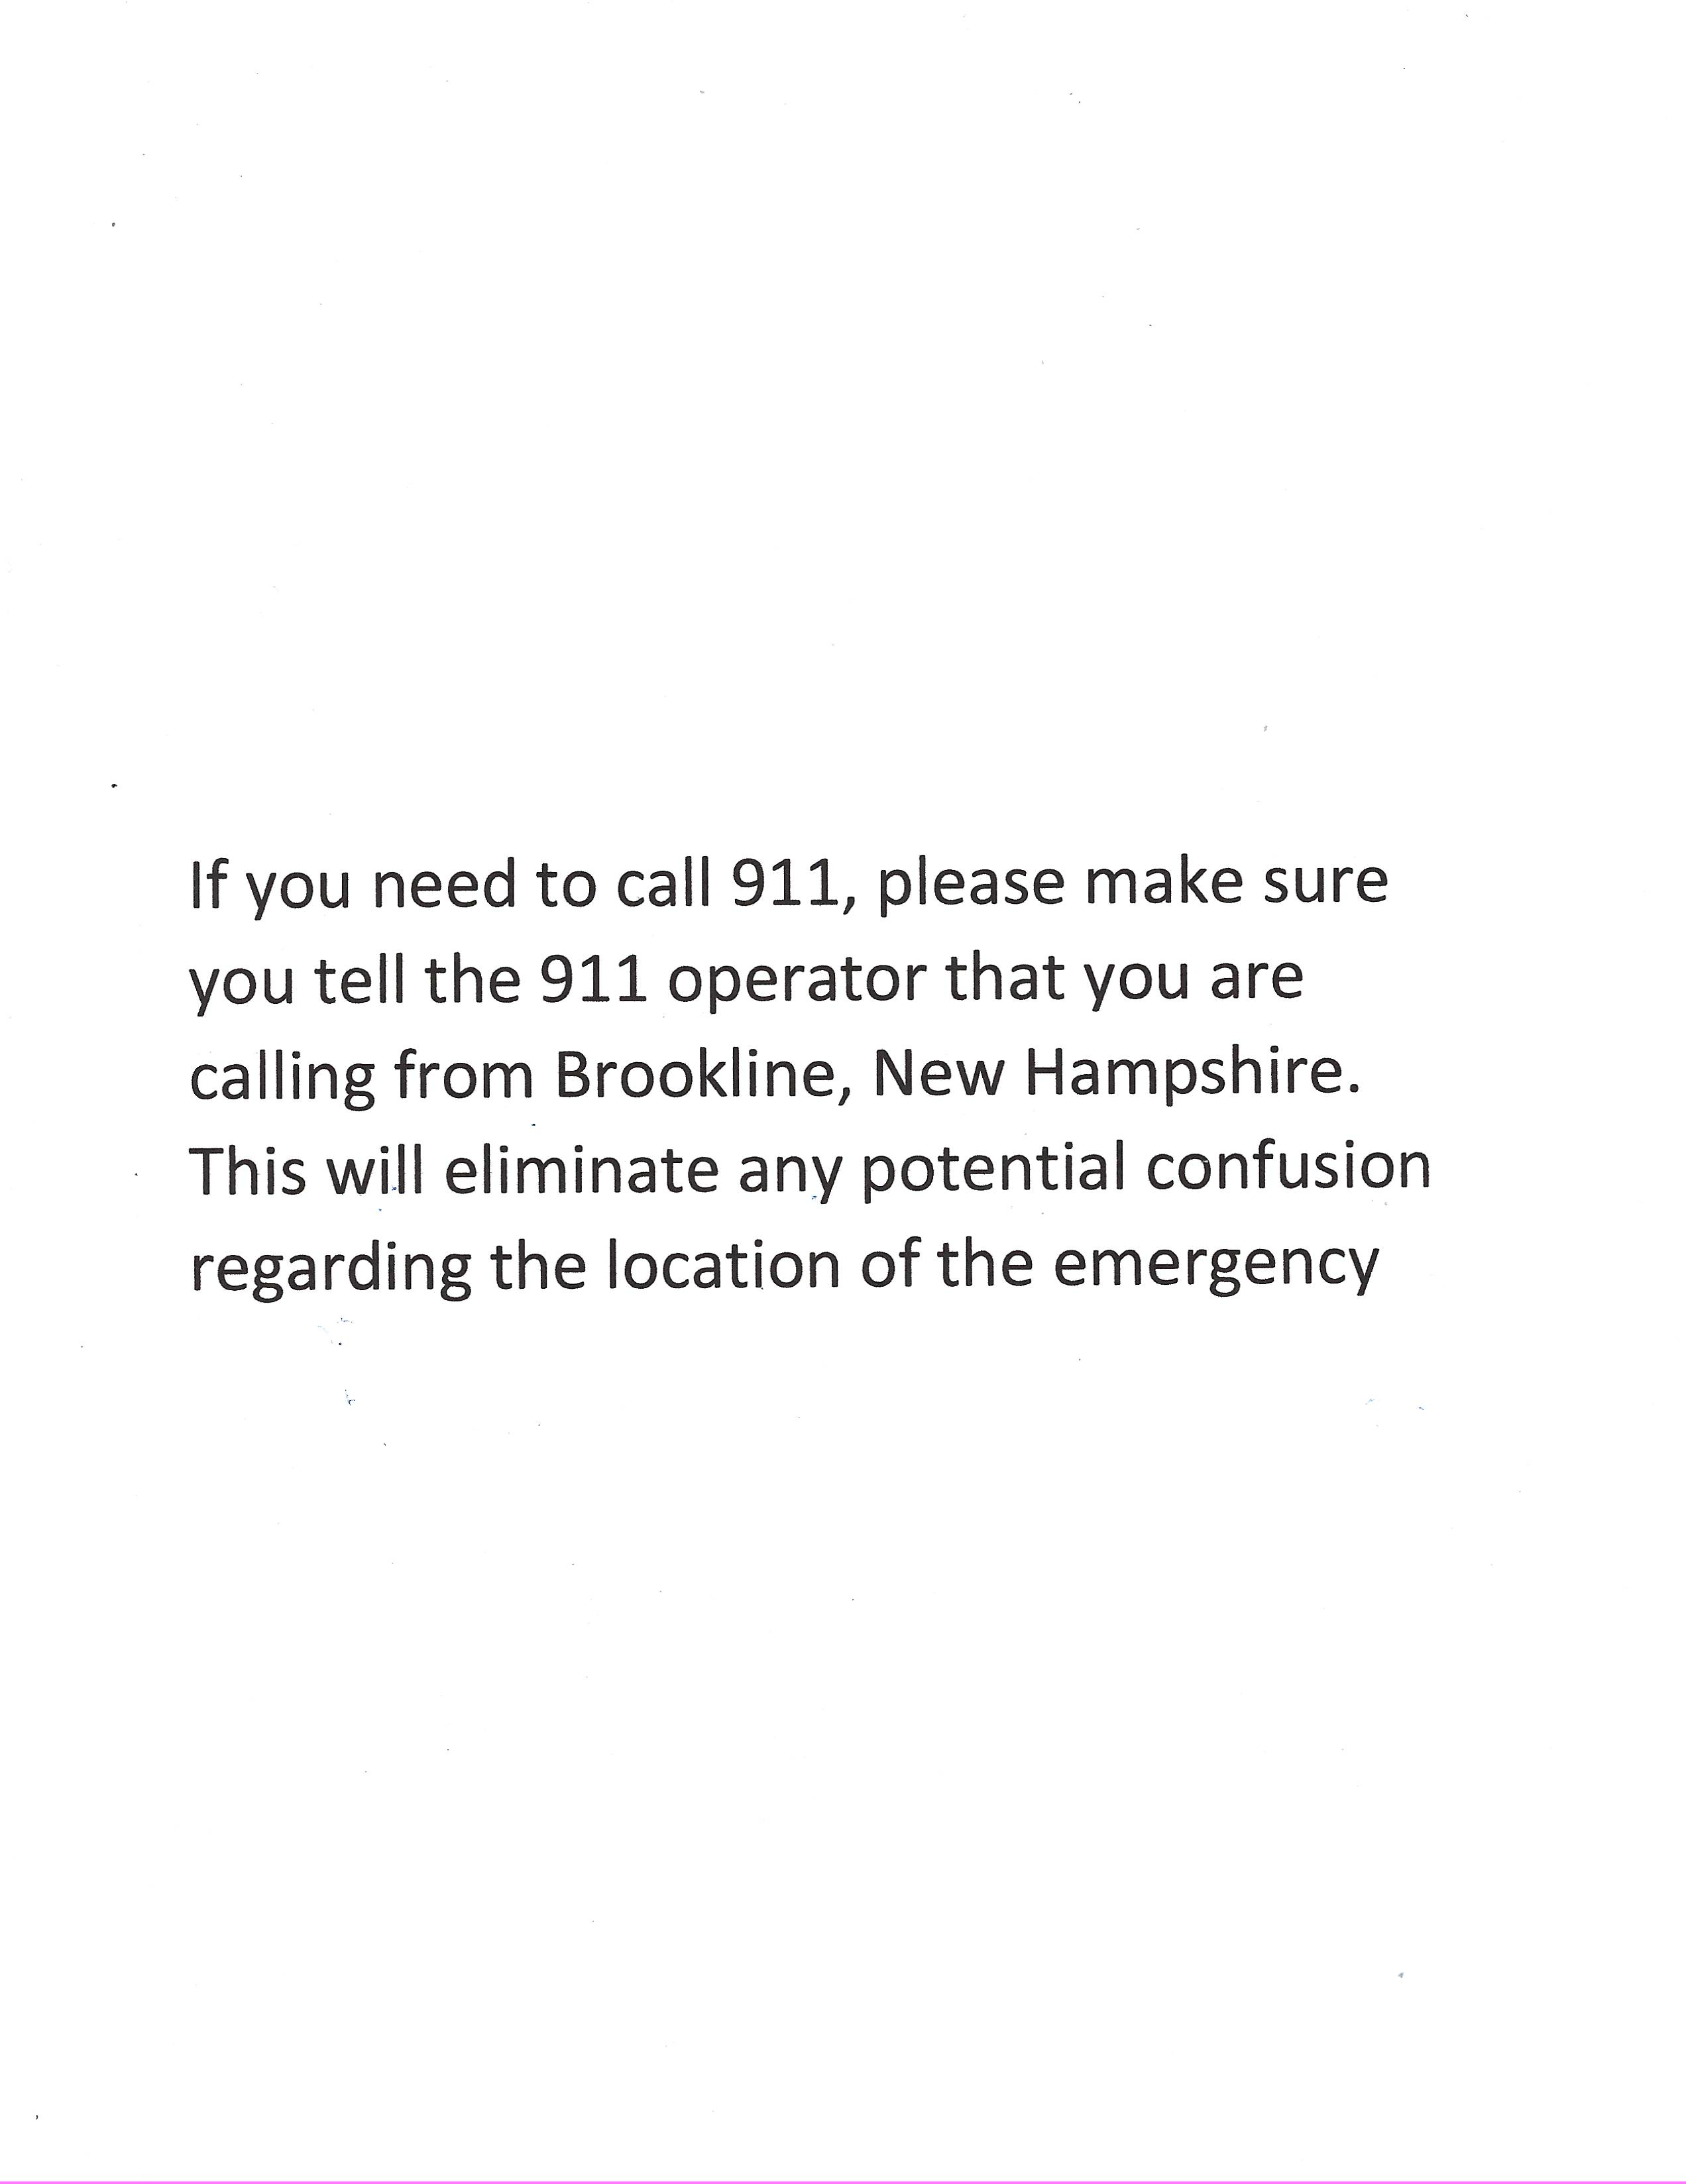 When you call 911